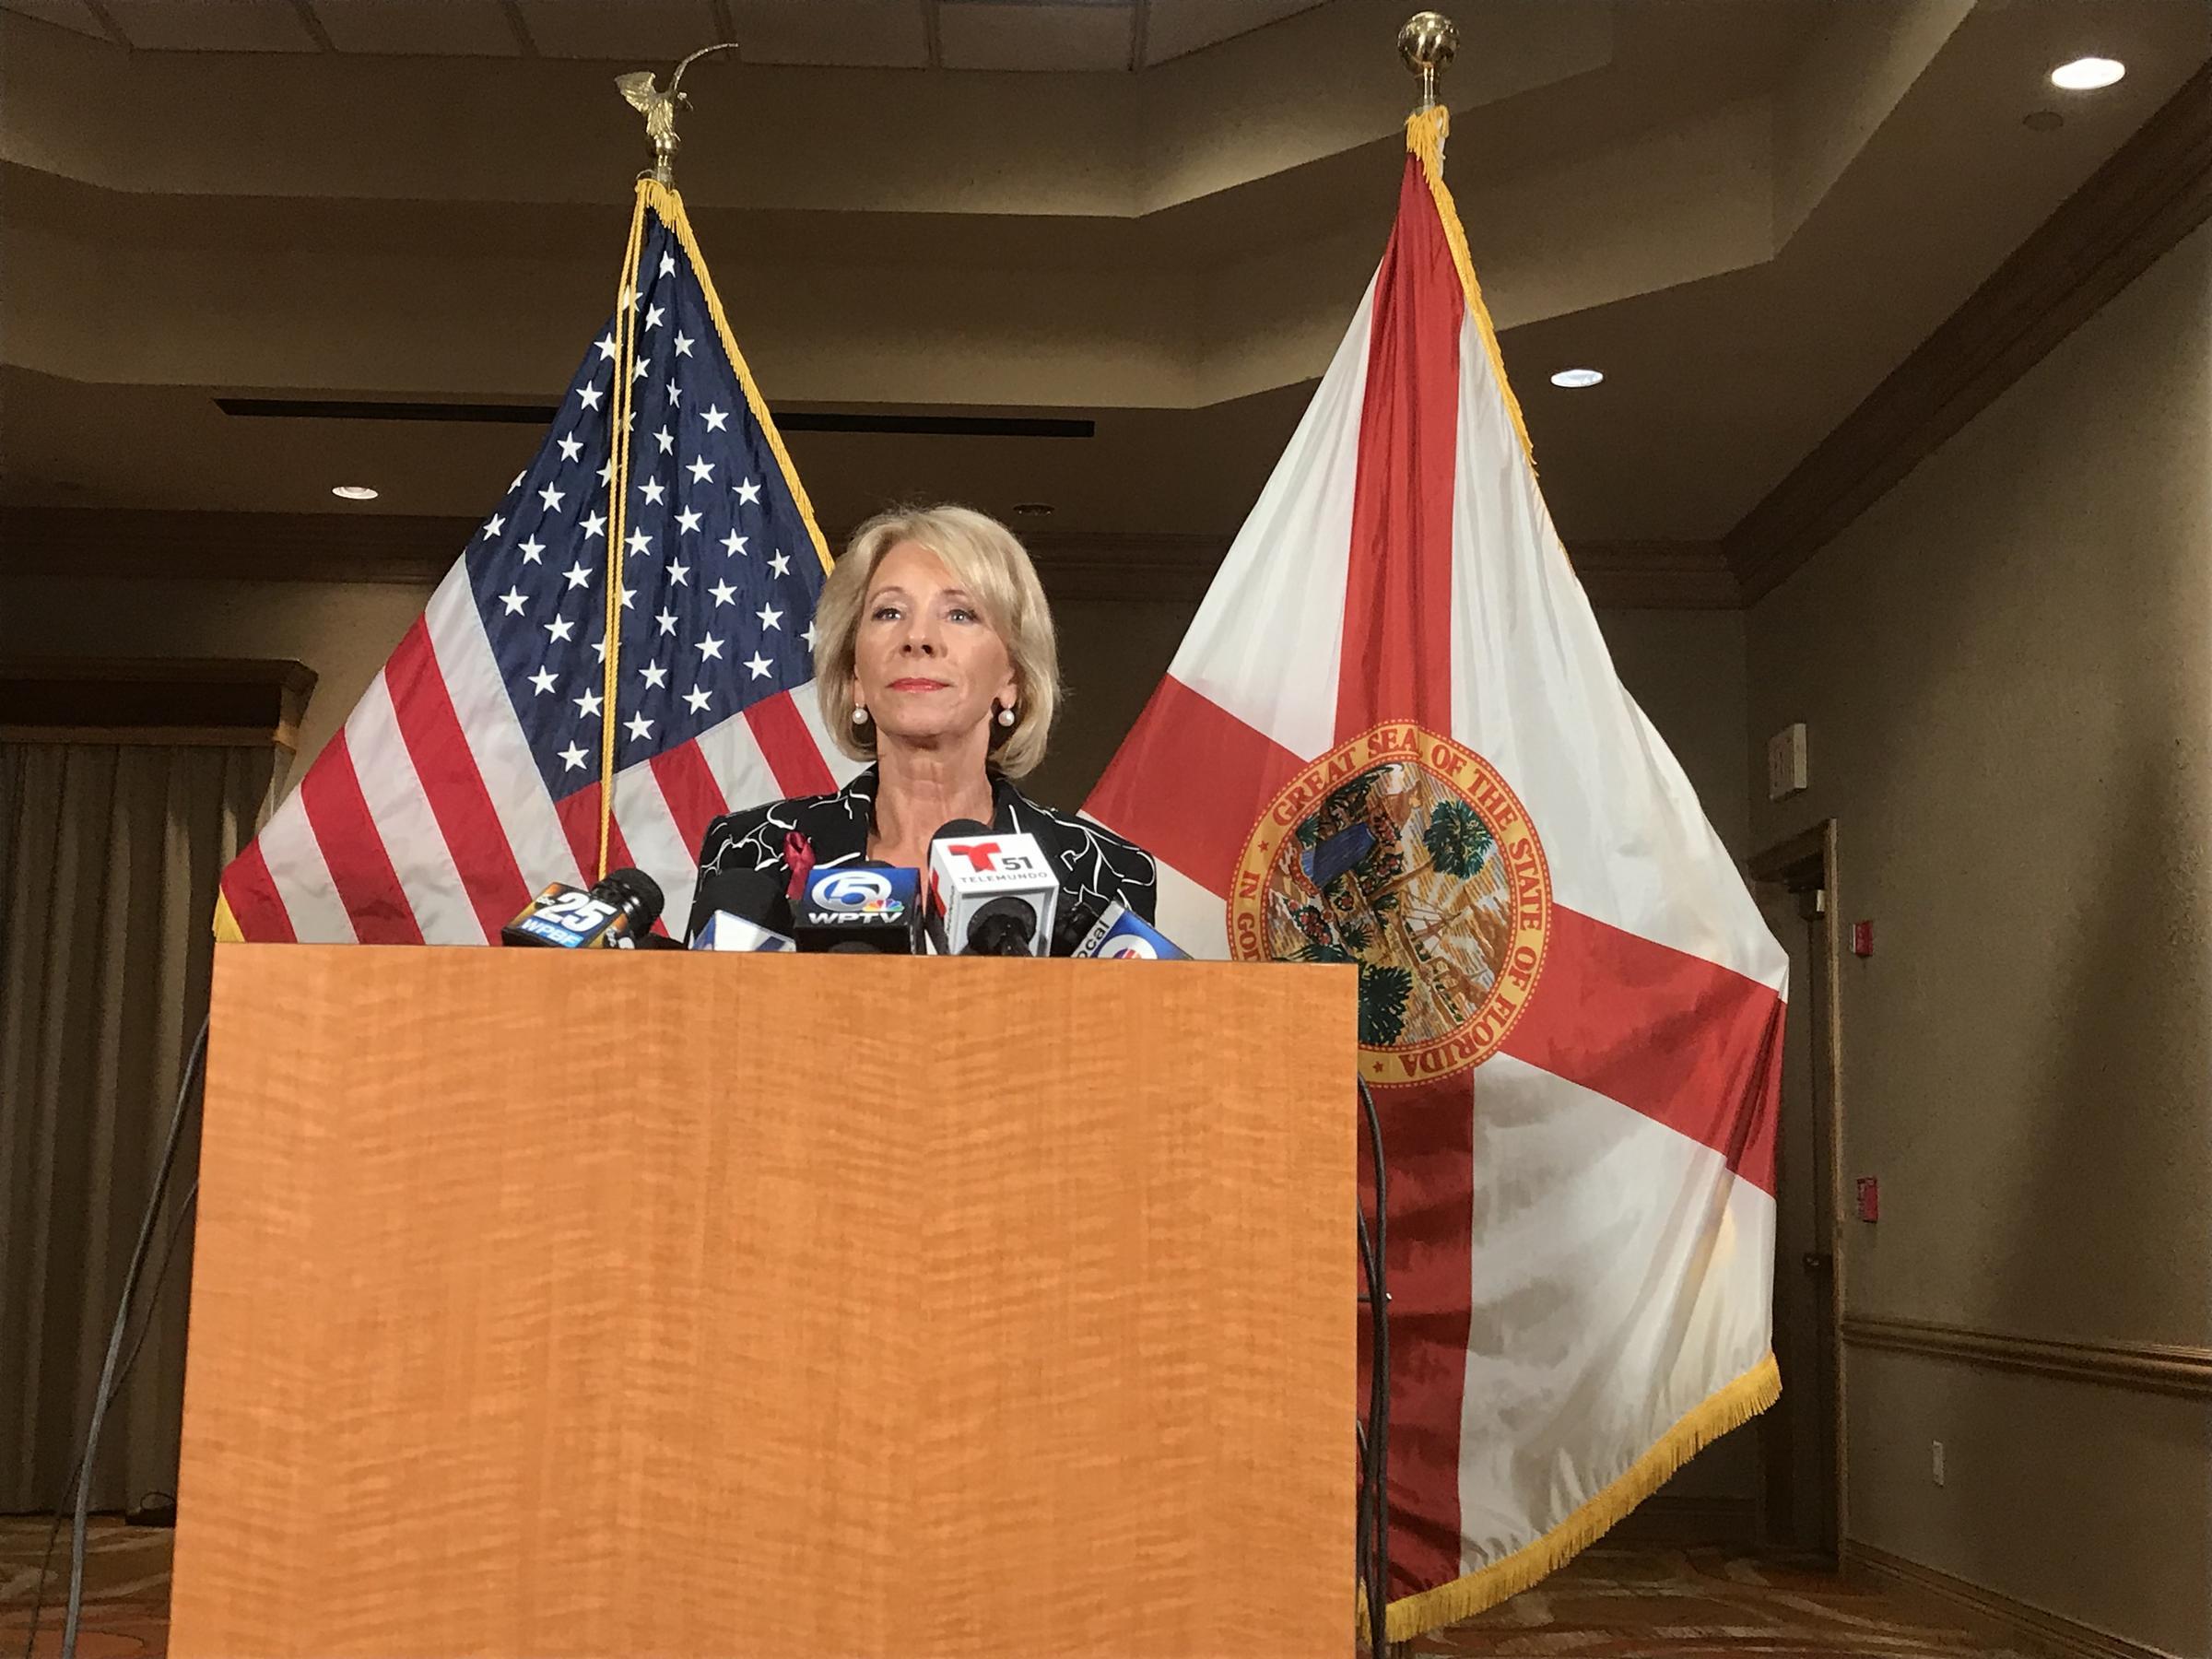 U.S. Secretary of Education Betsy DeVos spoke with the press following her  morning visit to Marjory Stoneman Douglas High School Wednesday. 806db81dff2d